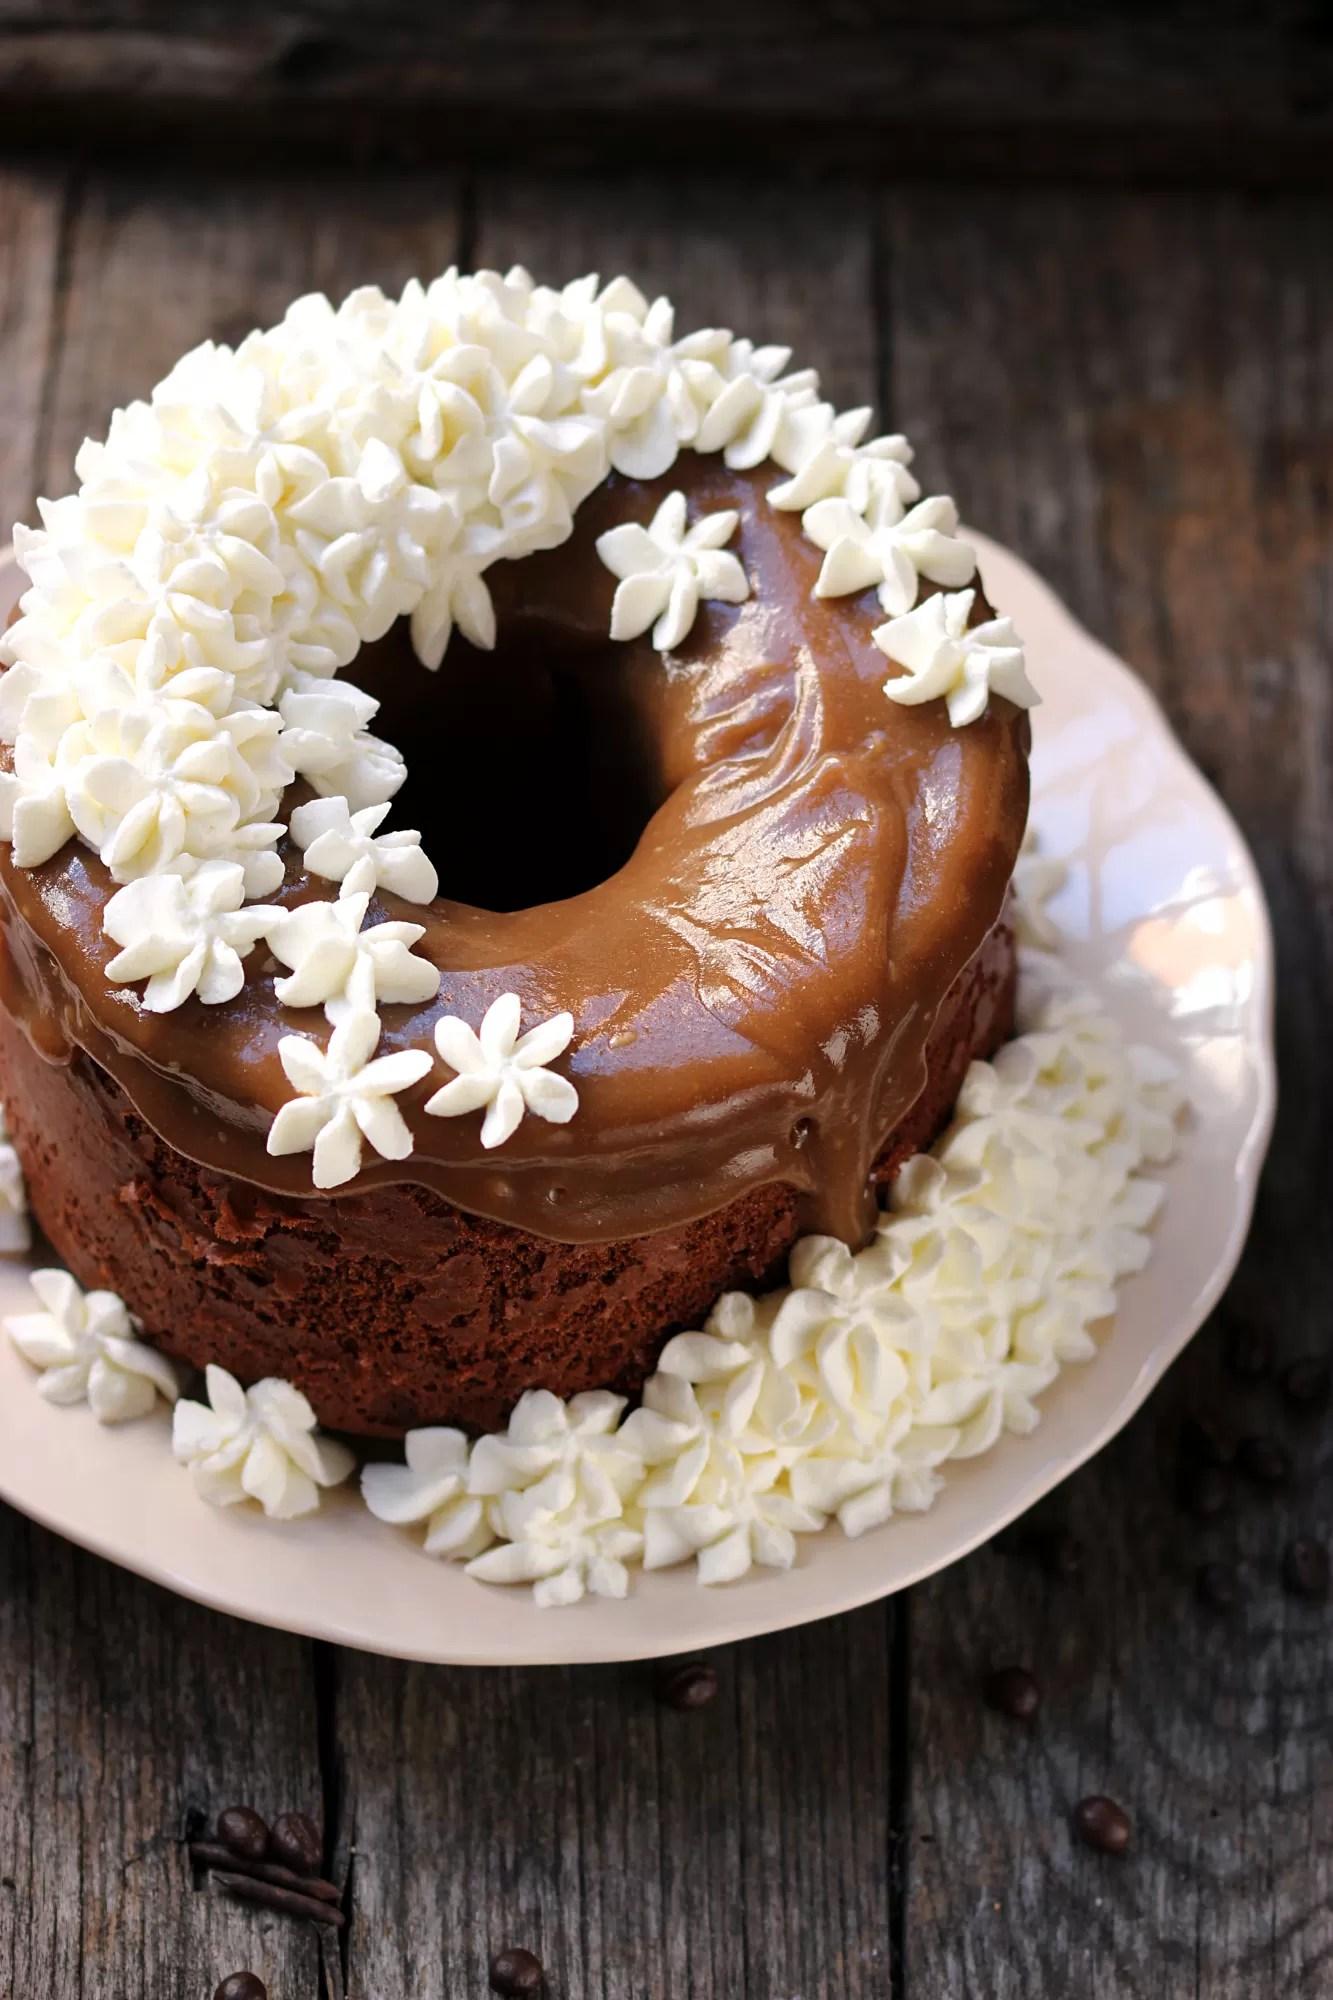 Chiffon Cake gusto panna e caffè